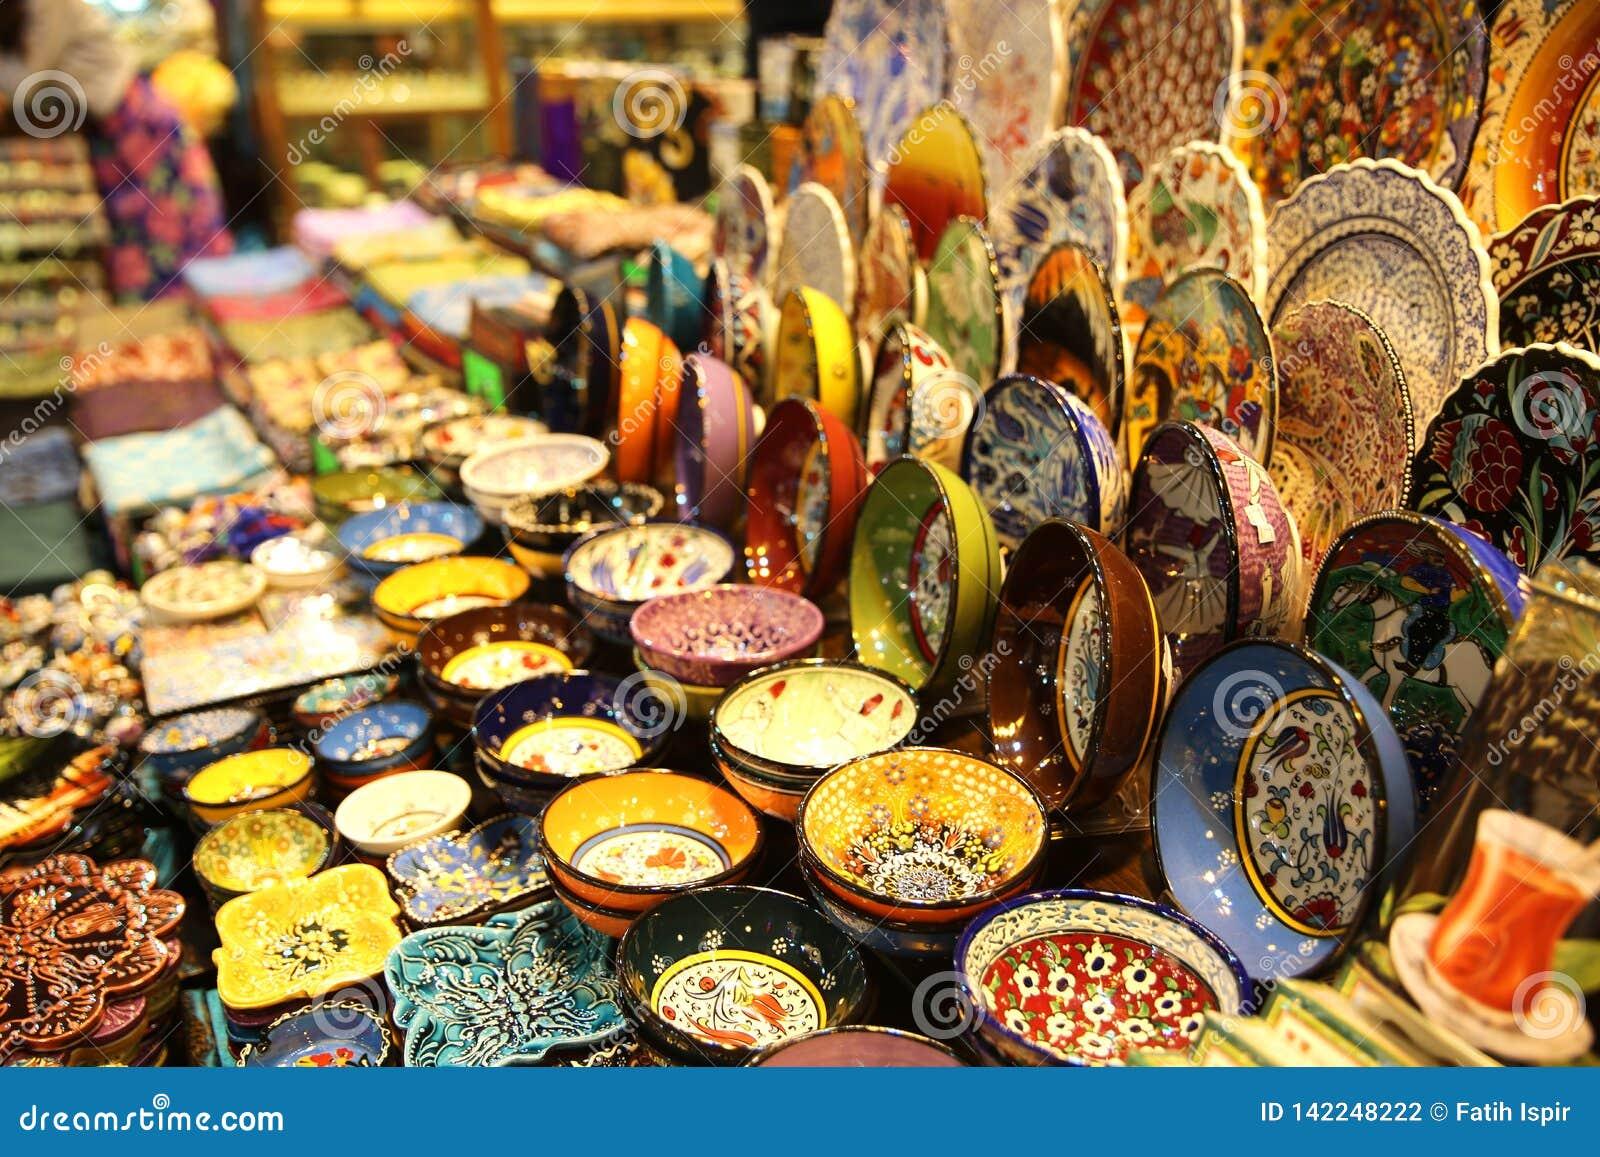 Loja de lembranças no bazar grande Istambul